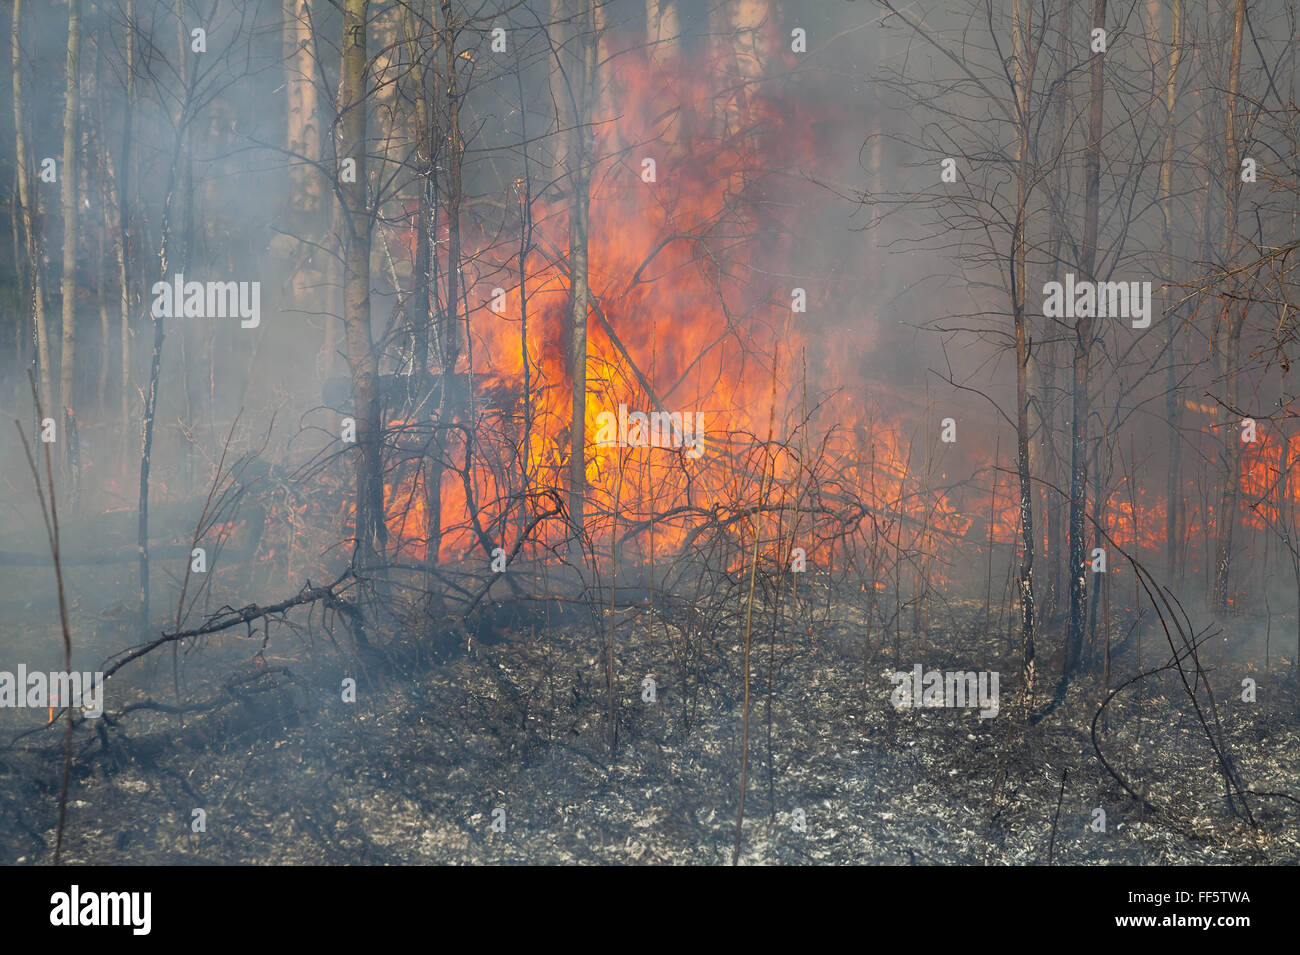 Wildfire - Stock Image